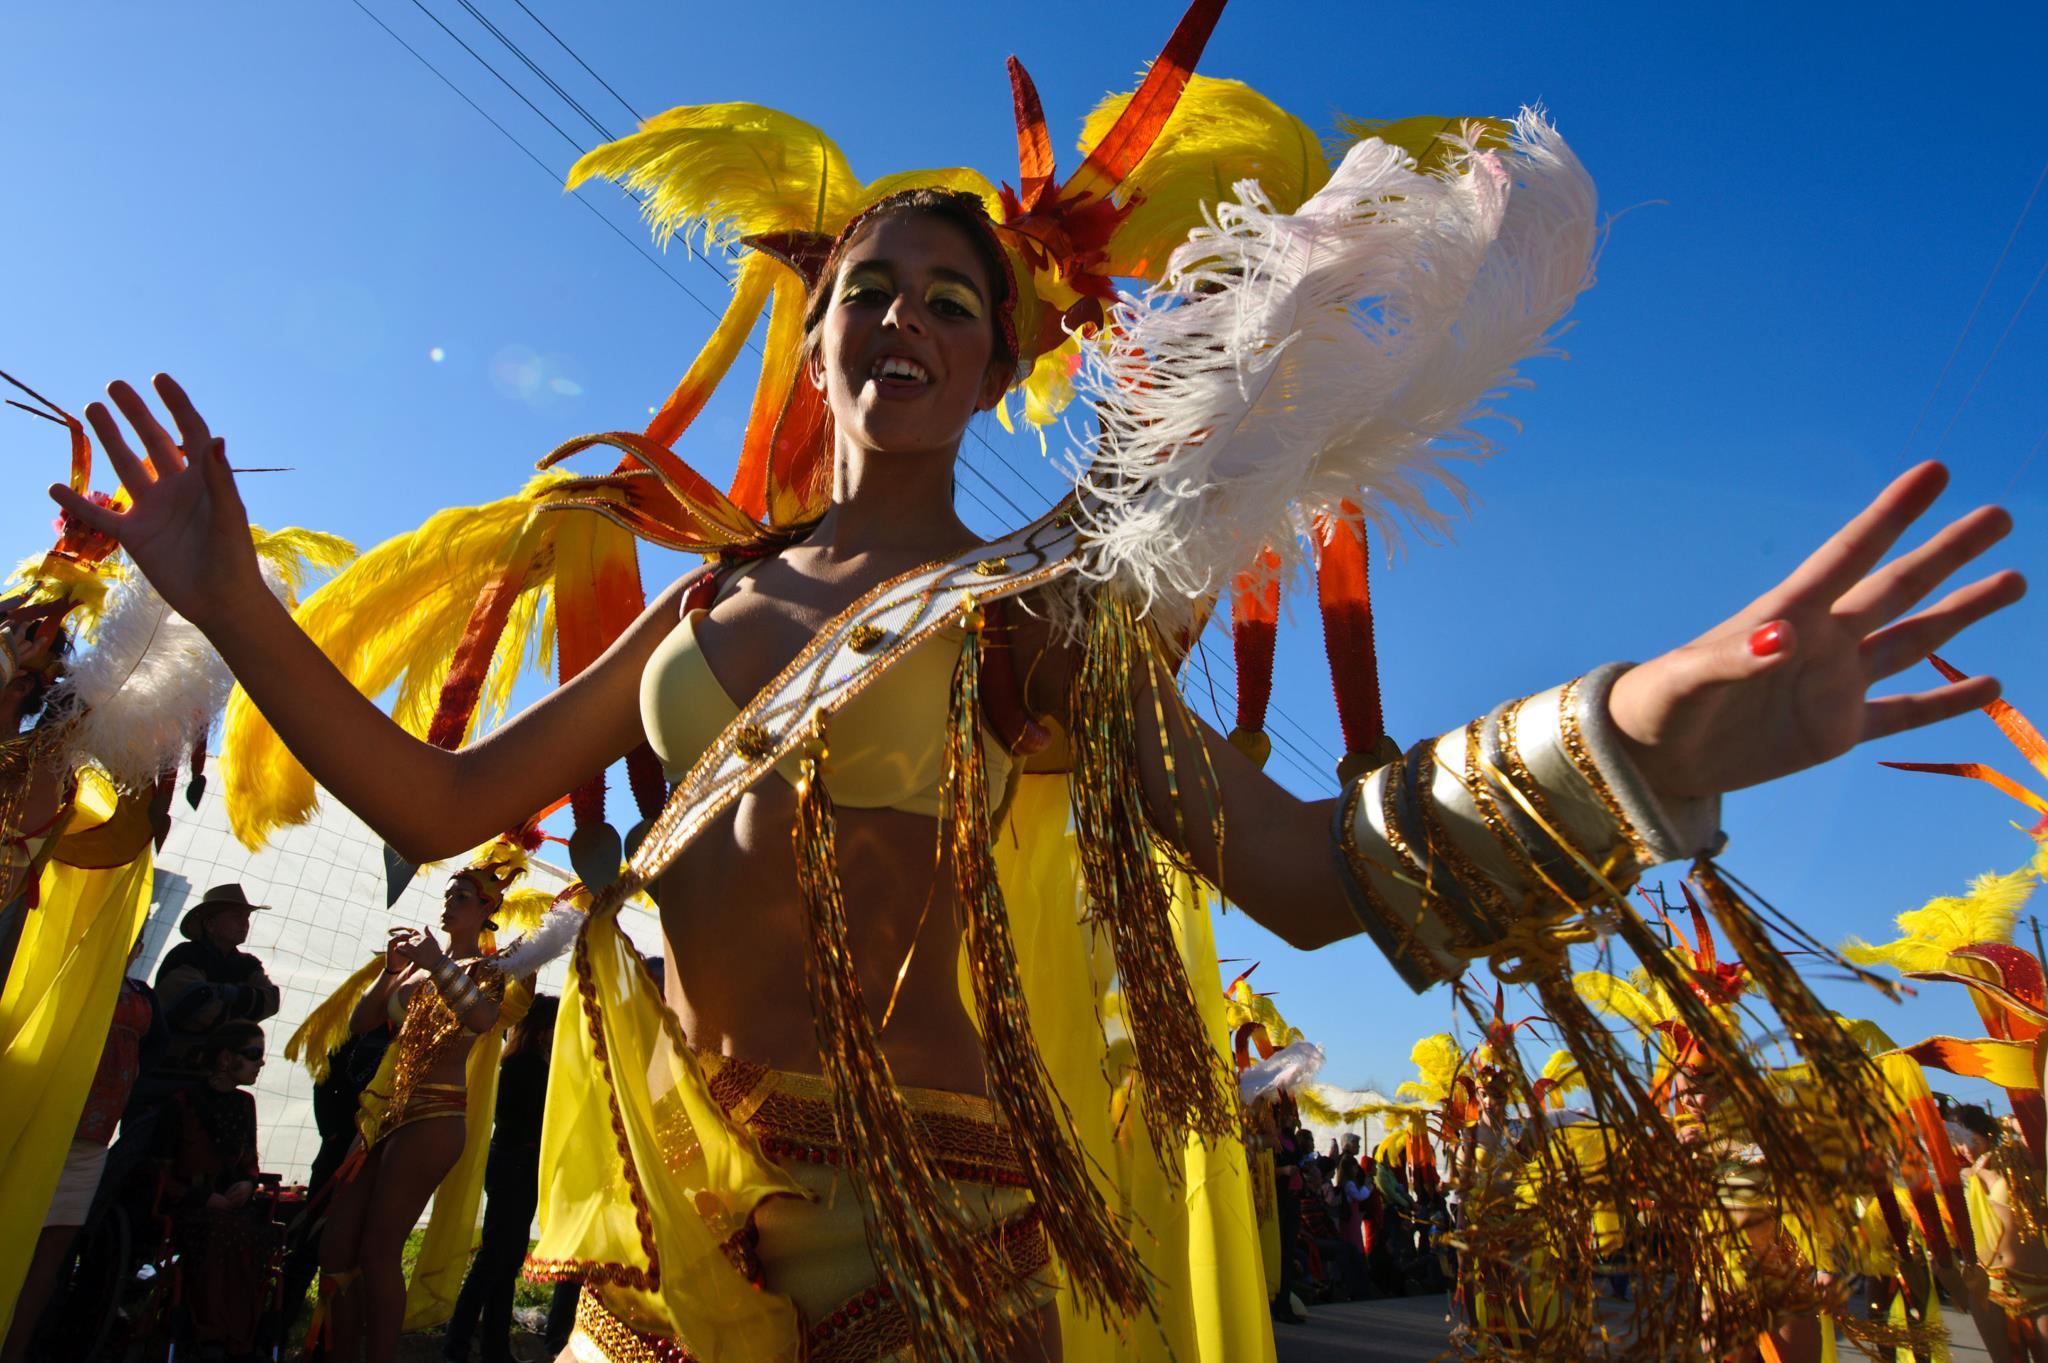 PÚBLICO - Governo dá tolerância de ponto no Carnaval